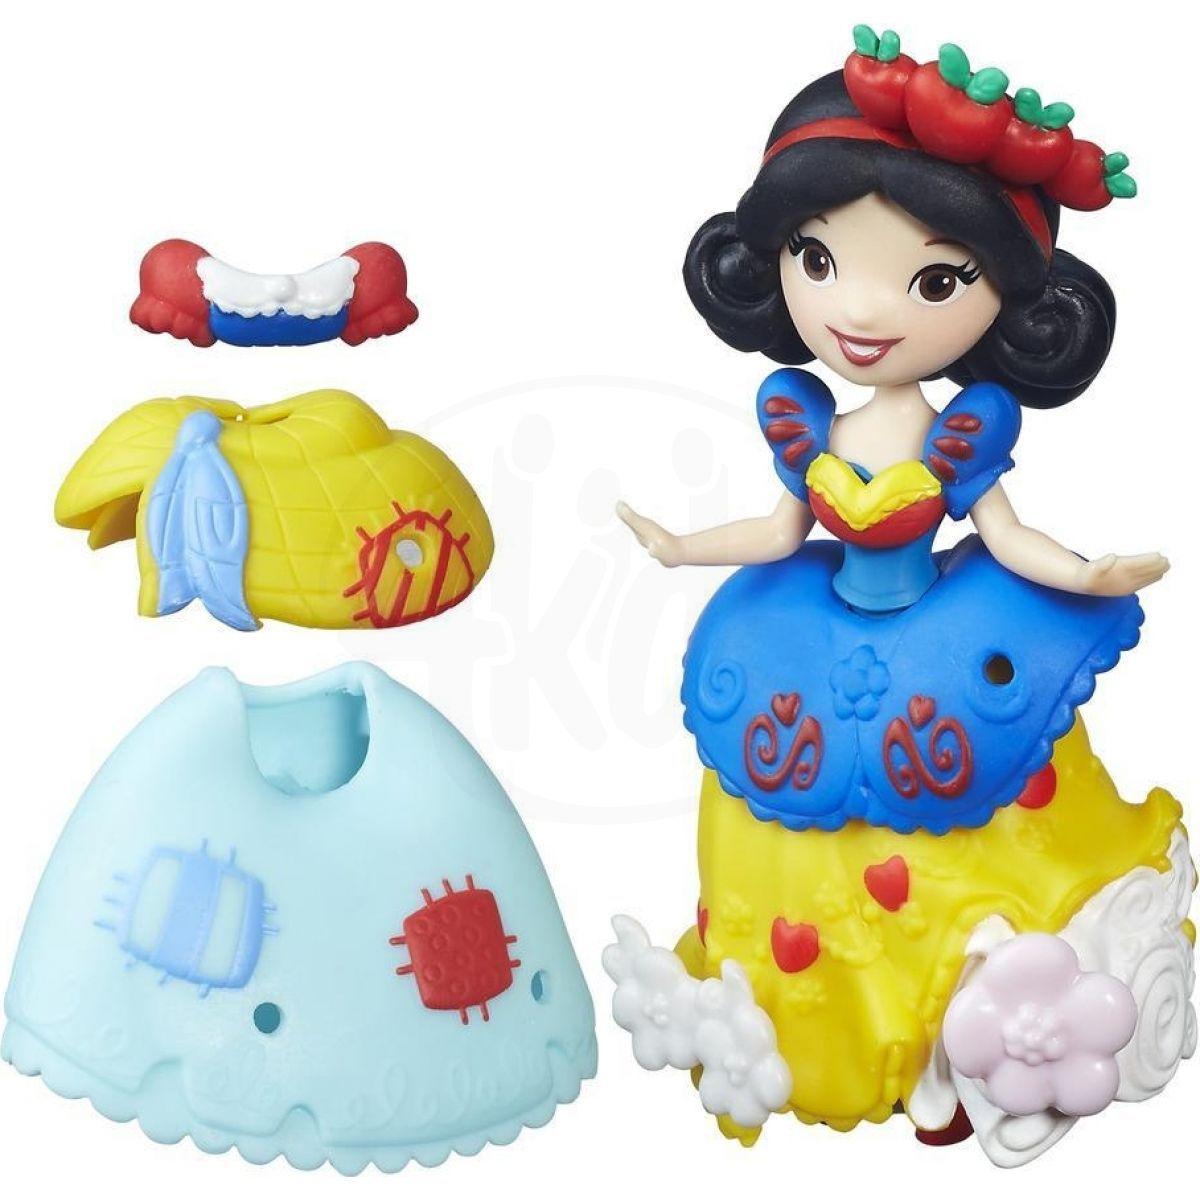 Hasbro Disney Princess Mini panenka s doplňky - Sněhurka